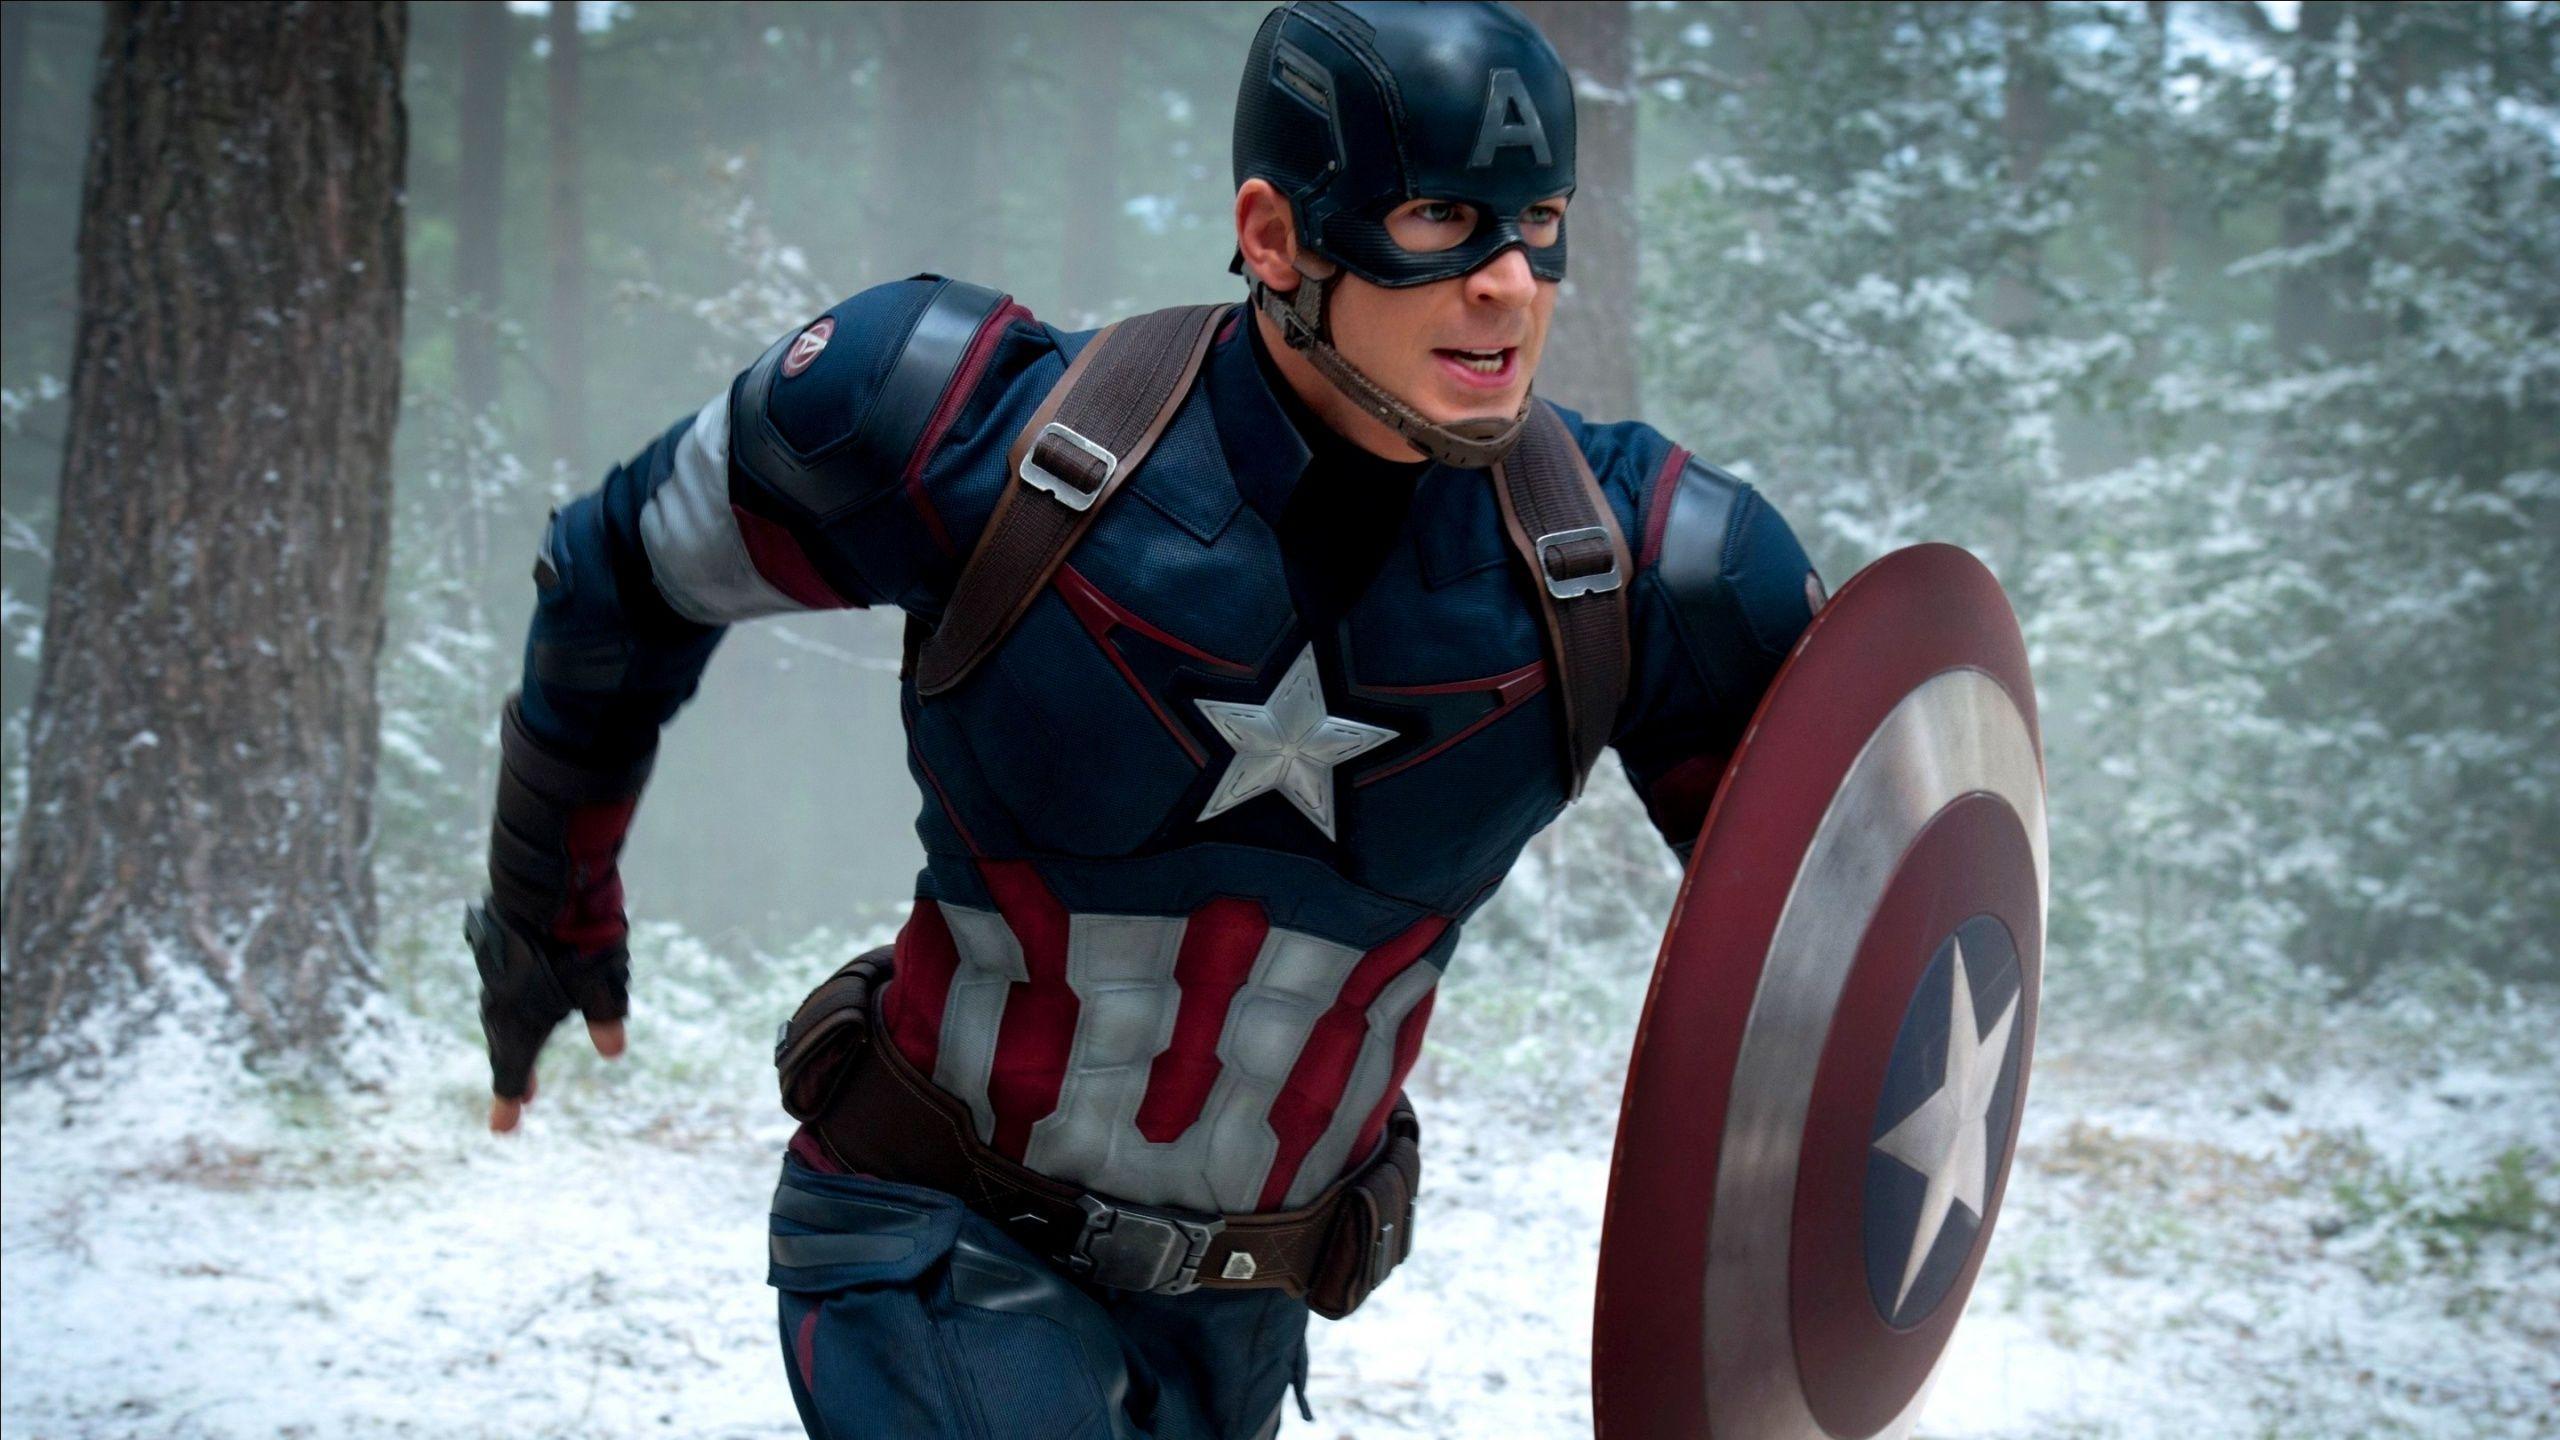 Movie Wallpaper: Captain America Wallpaper Chris Evans Wallpapers ...